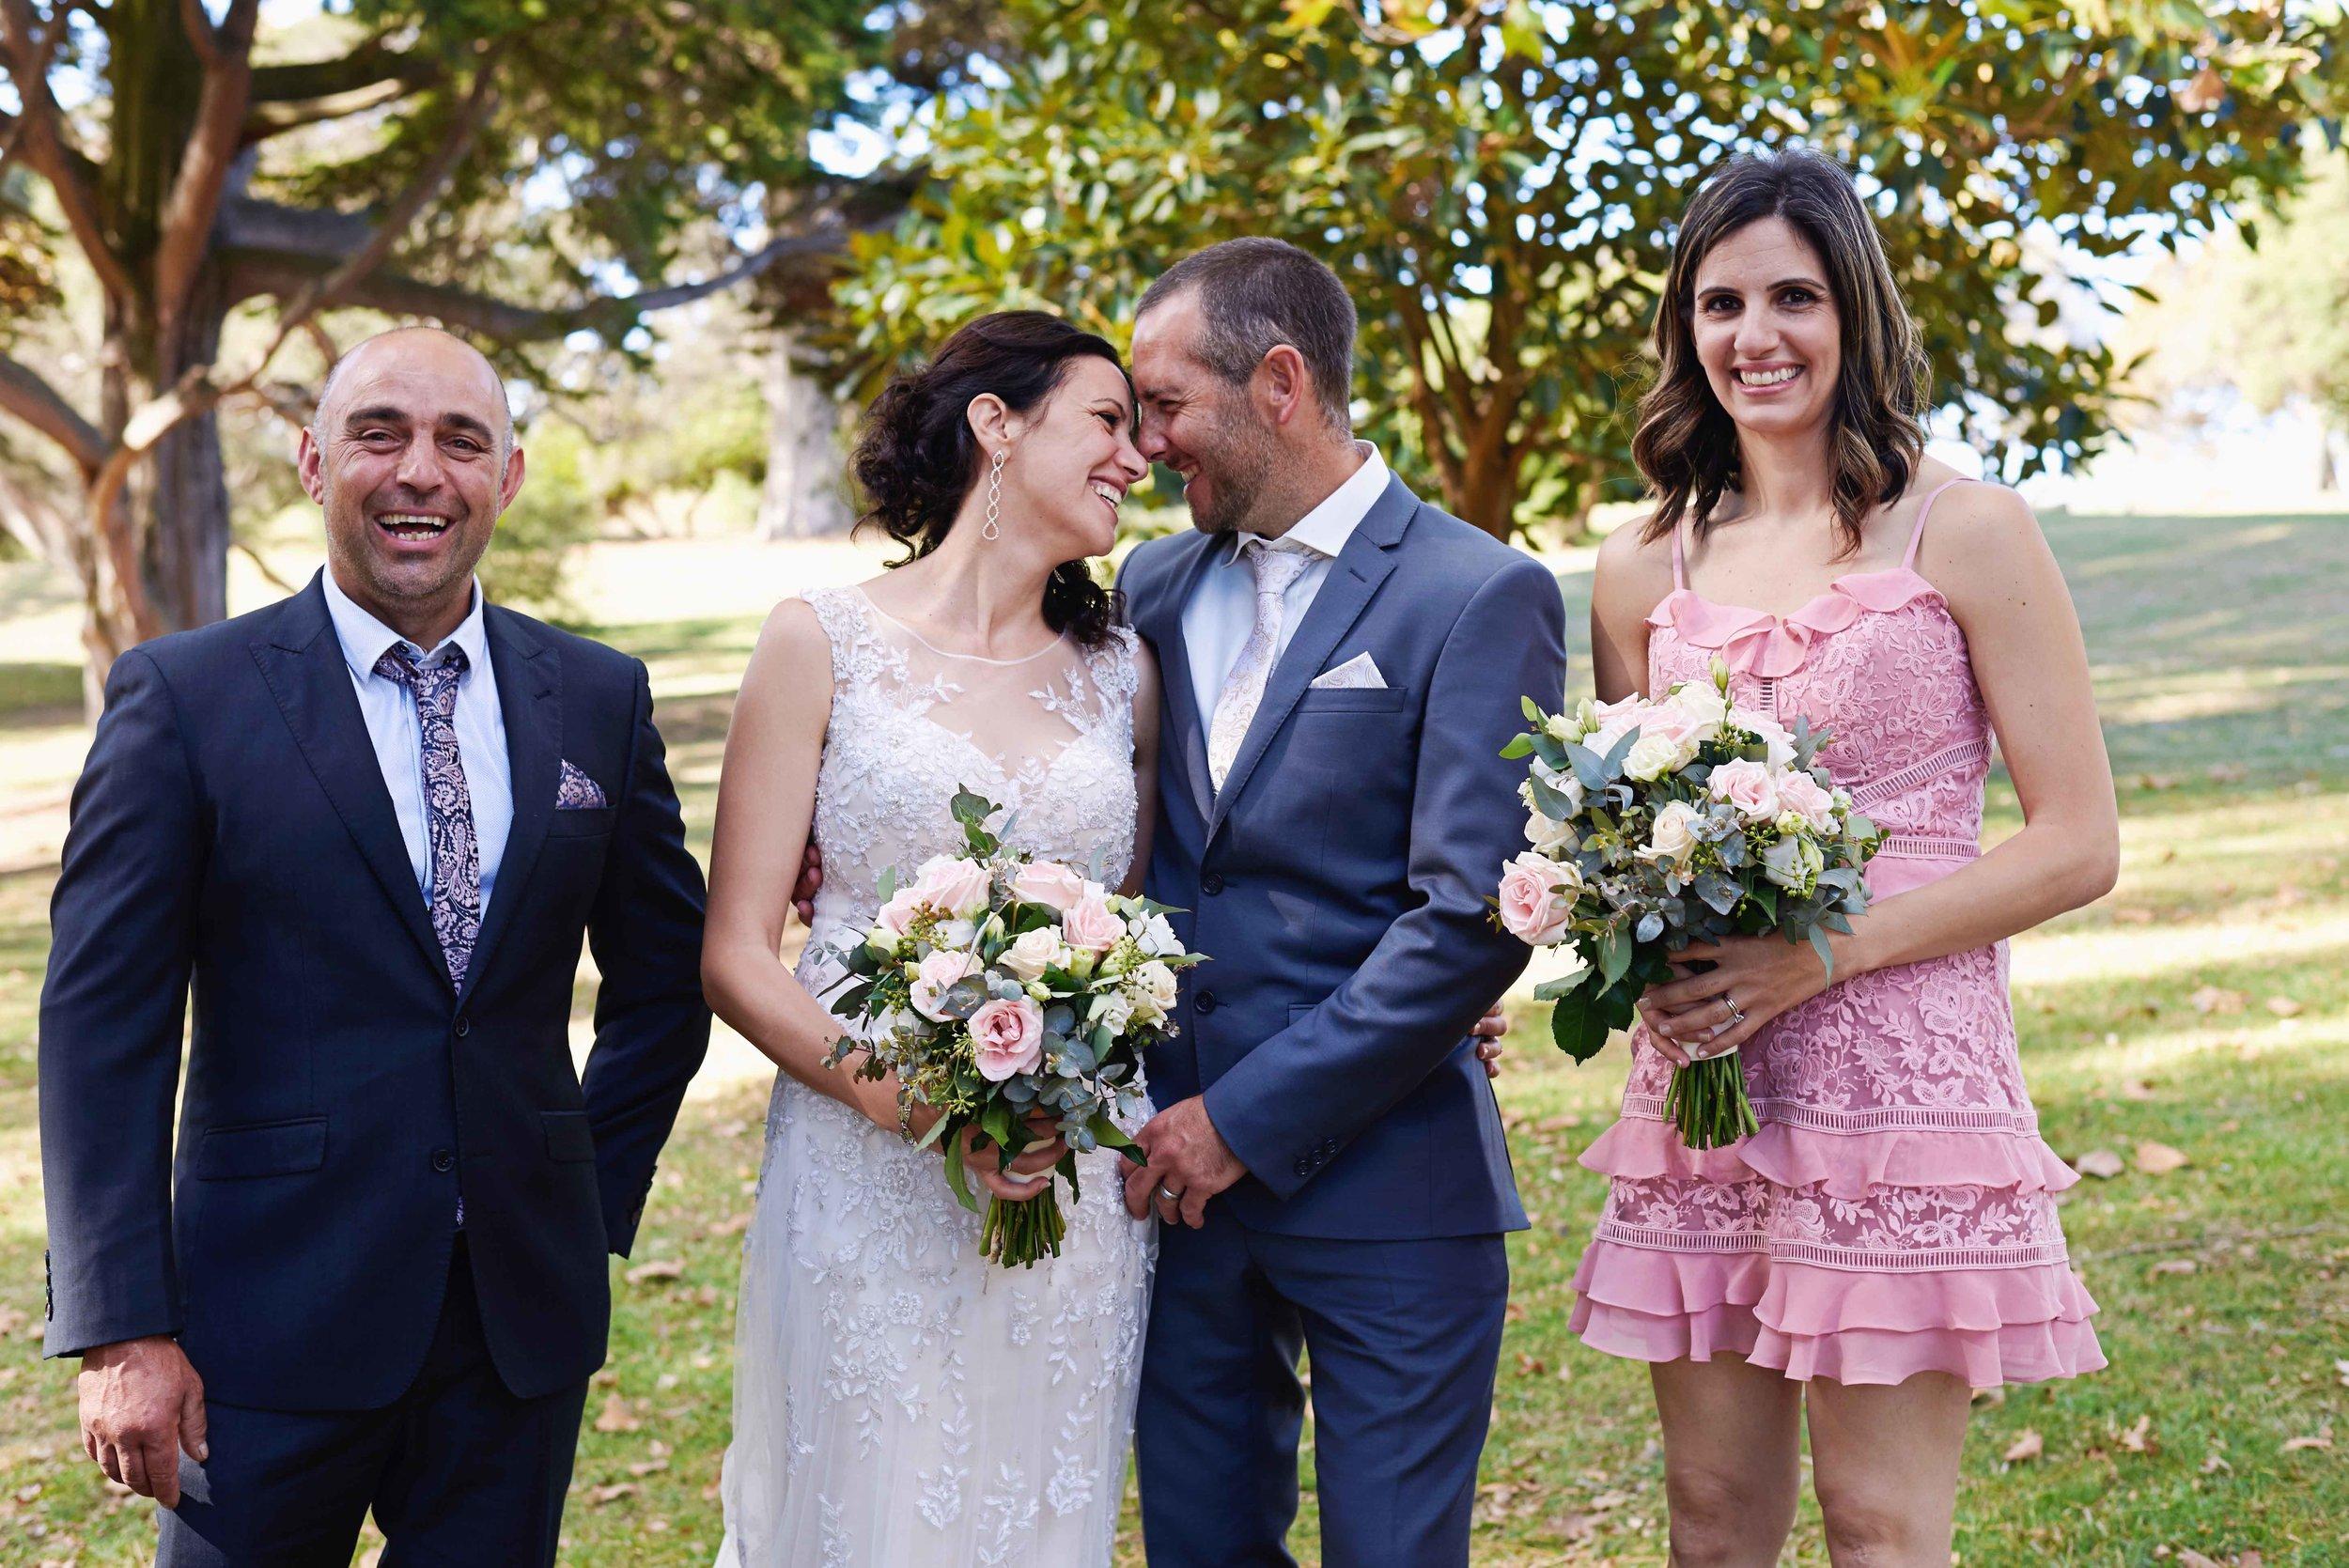 sorrento-wedding-photography-all-smiles-marissa-jade-photography-130.jpg